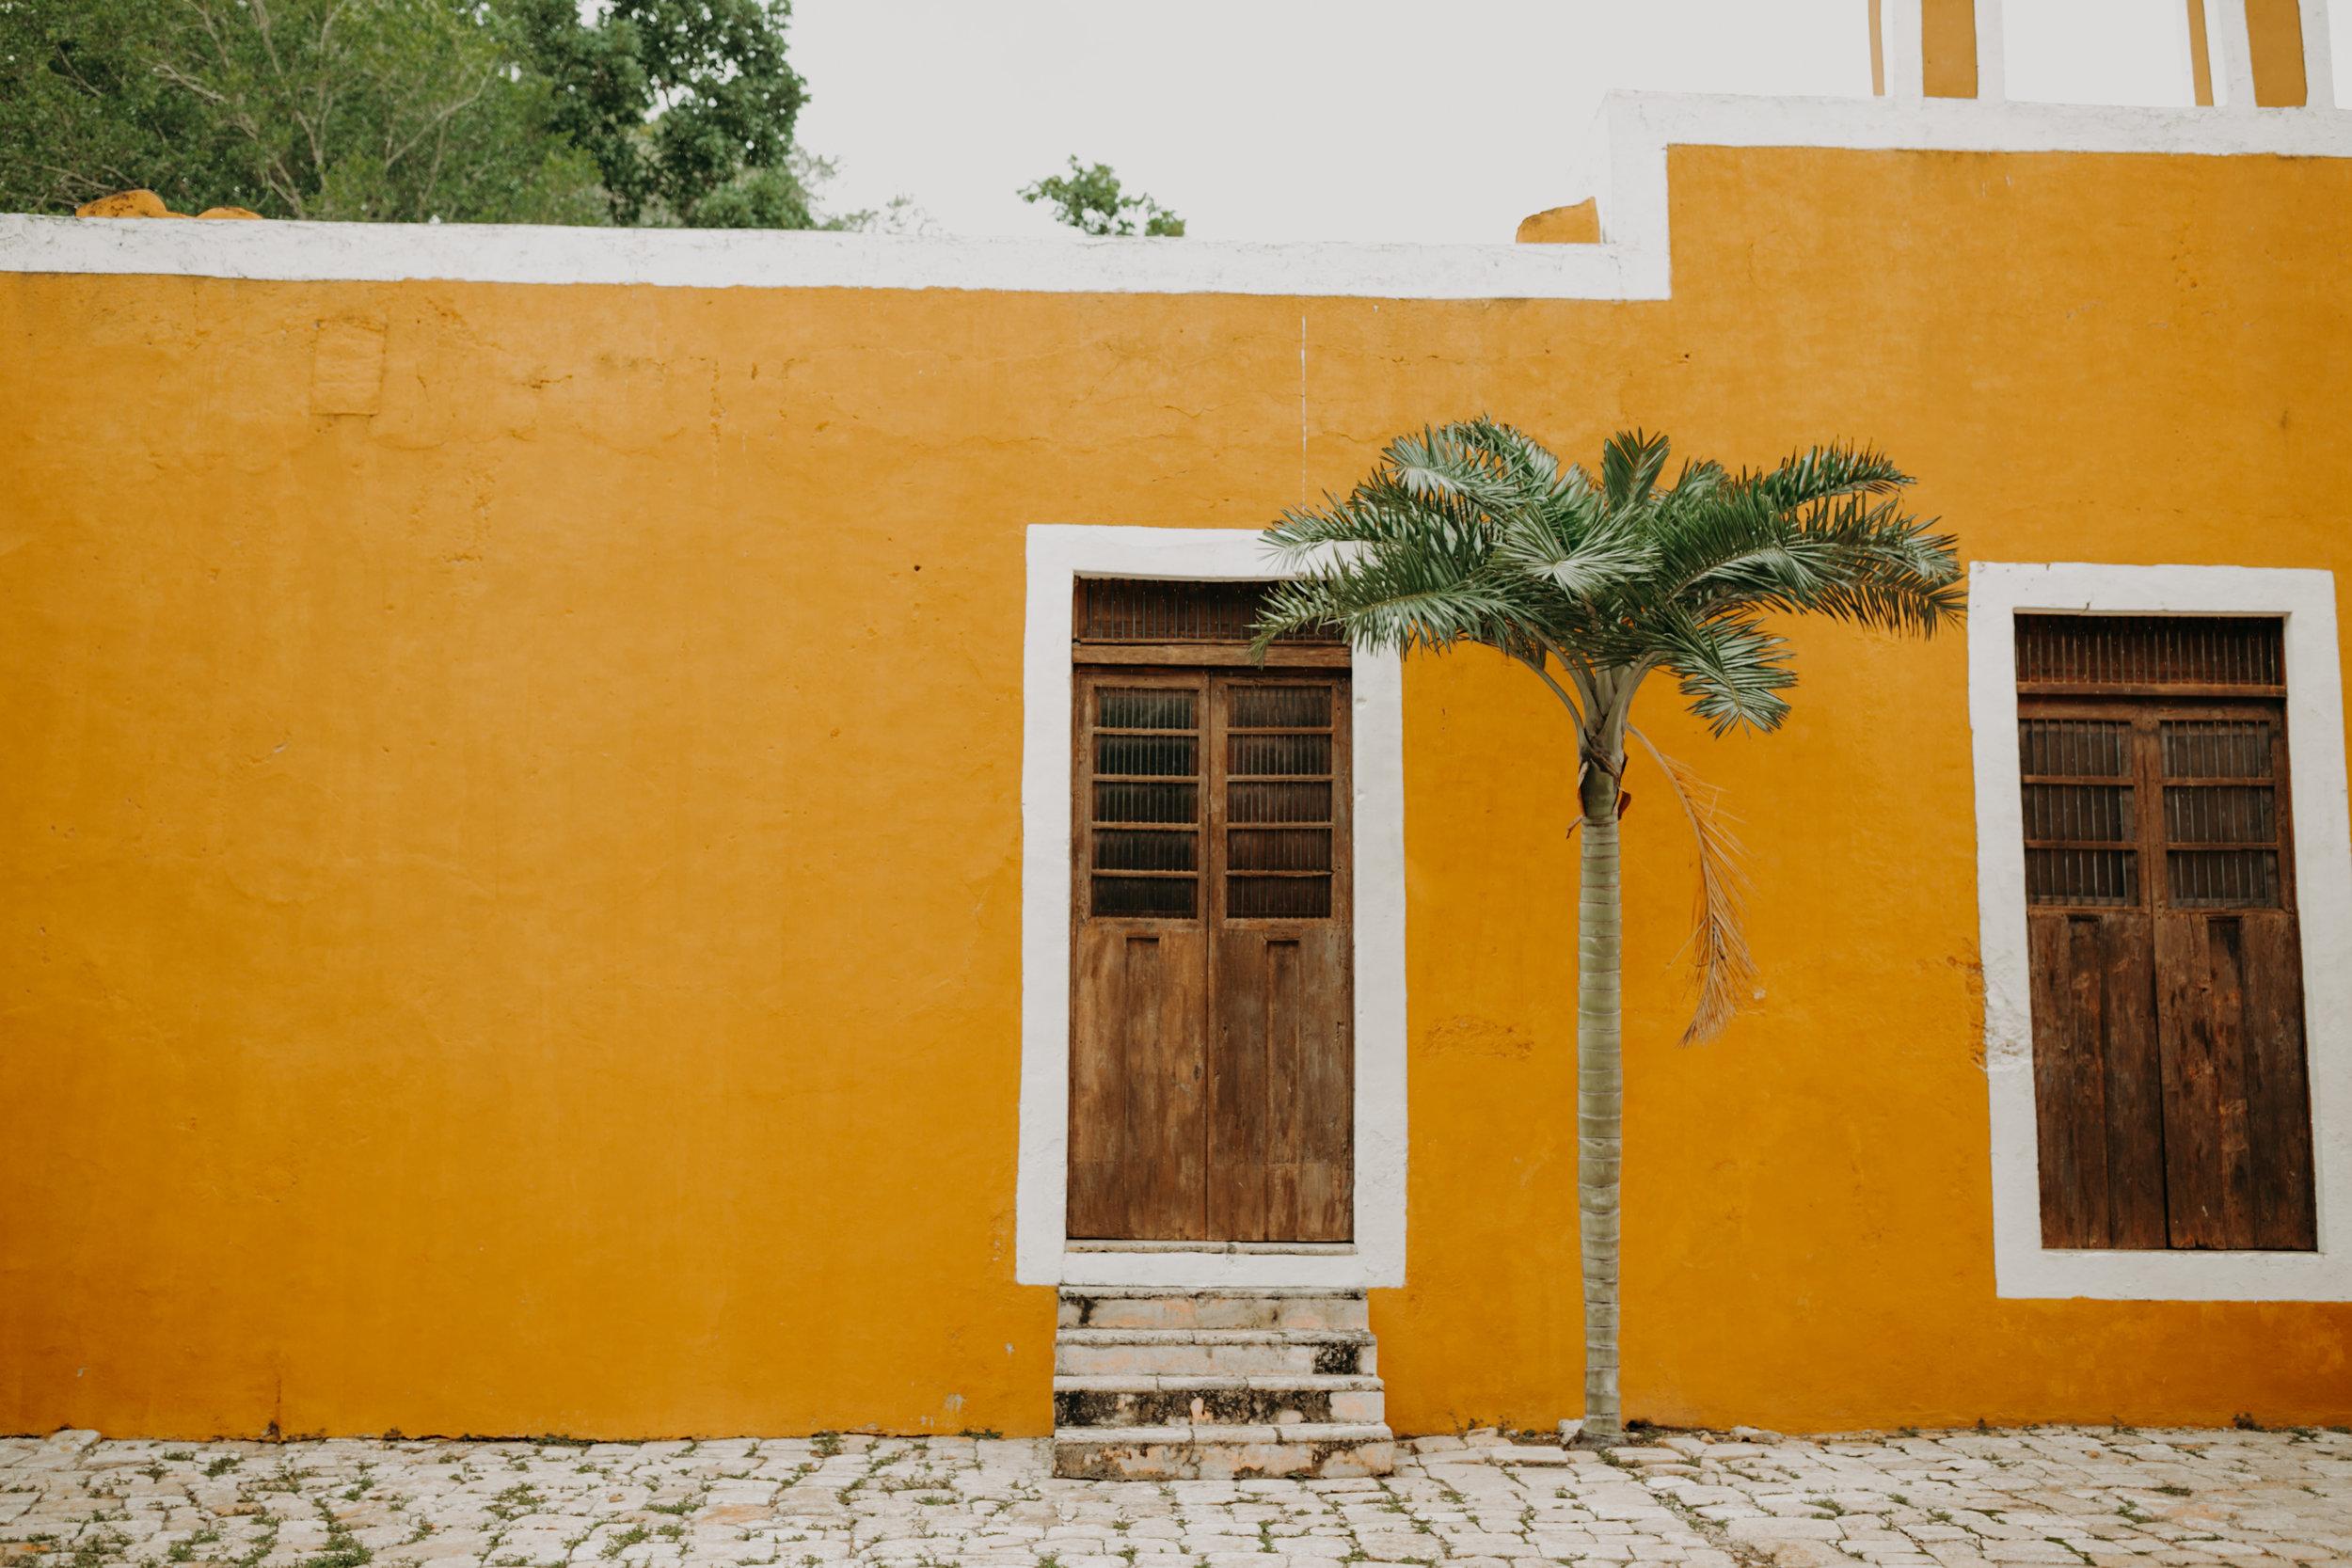 Hacienda Temozon Yucatan Mexico Wedding | Ida & Peter Emily Magers Photography-21.jpg